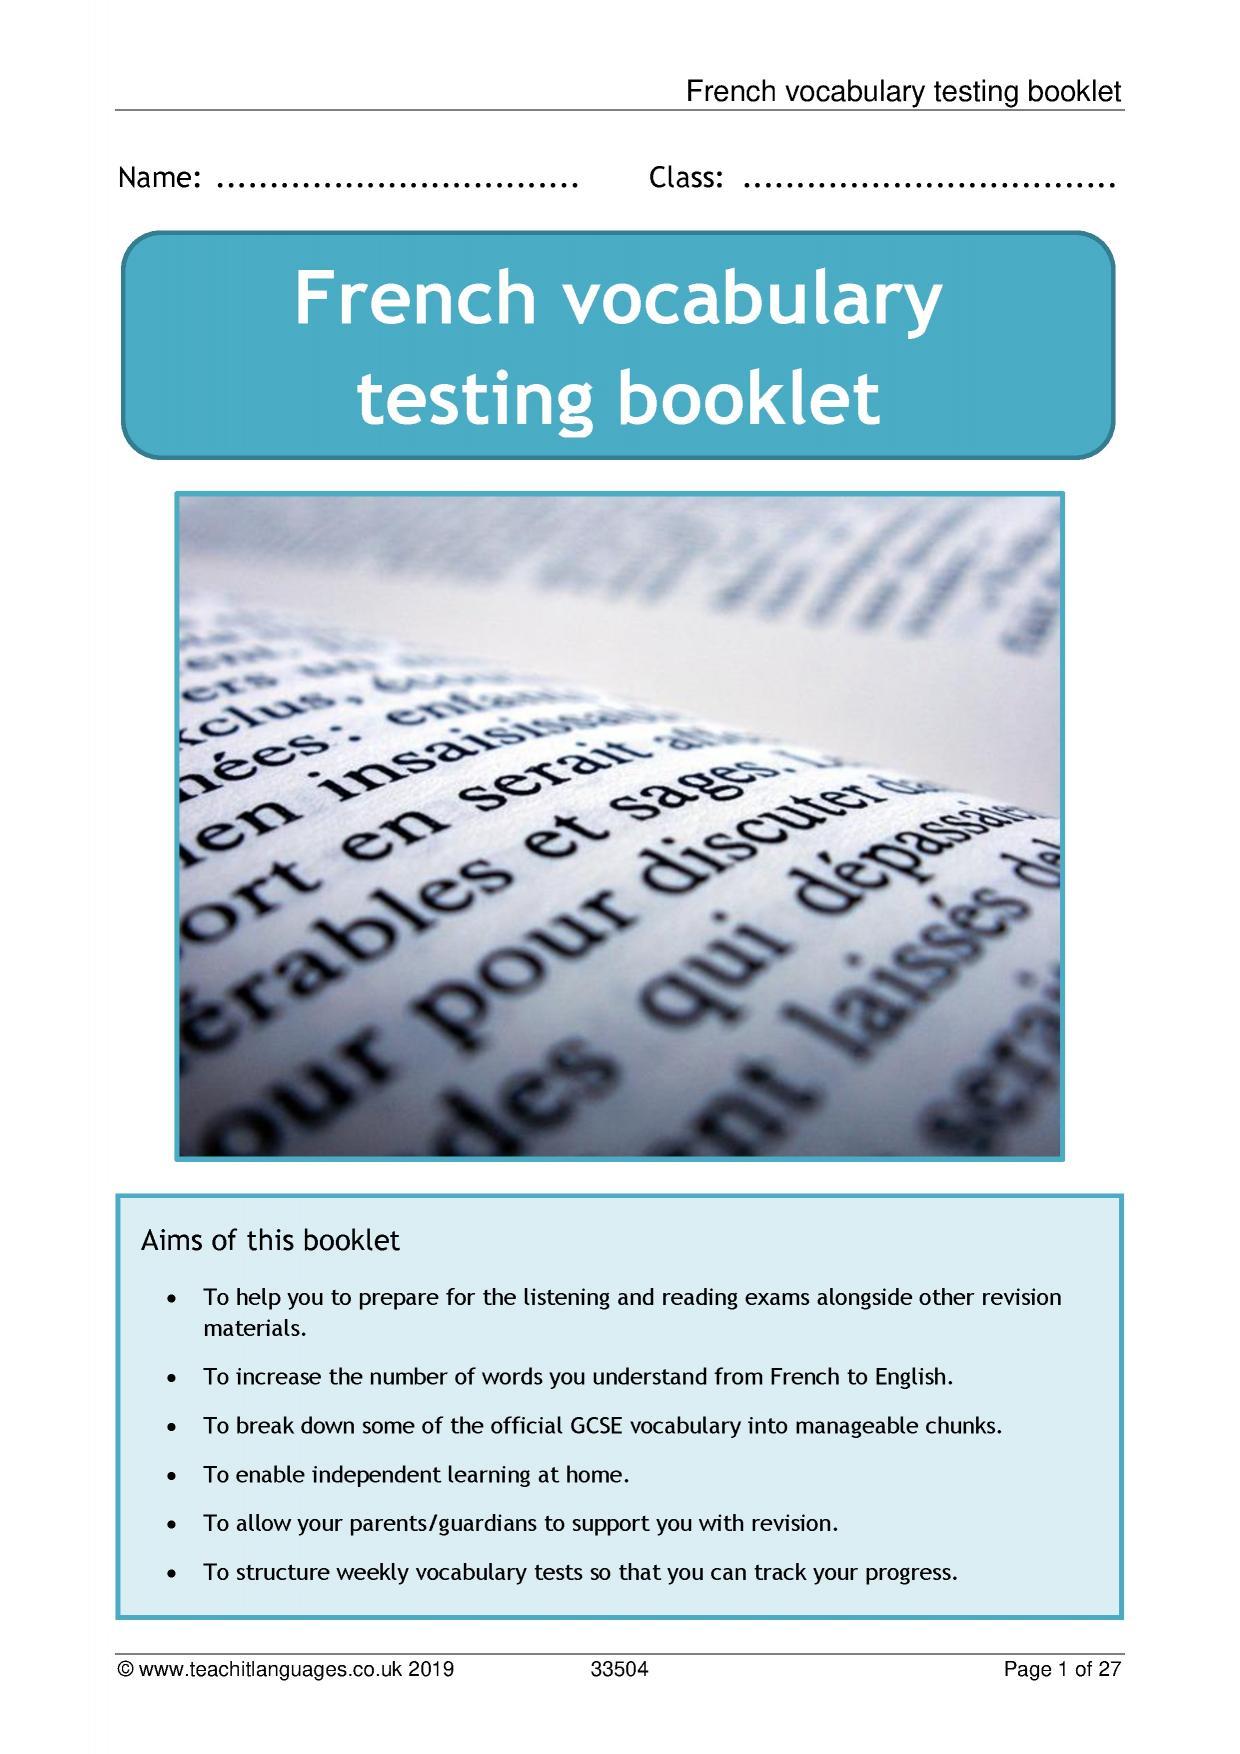 French language teaching resources   TeachIt Languages - Teachit